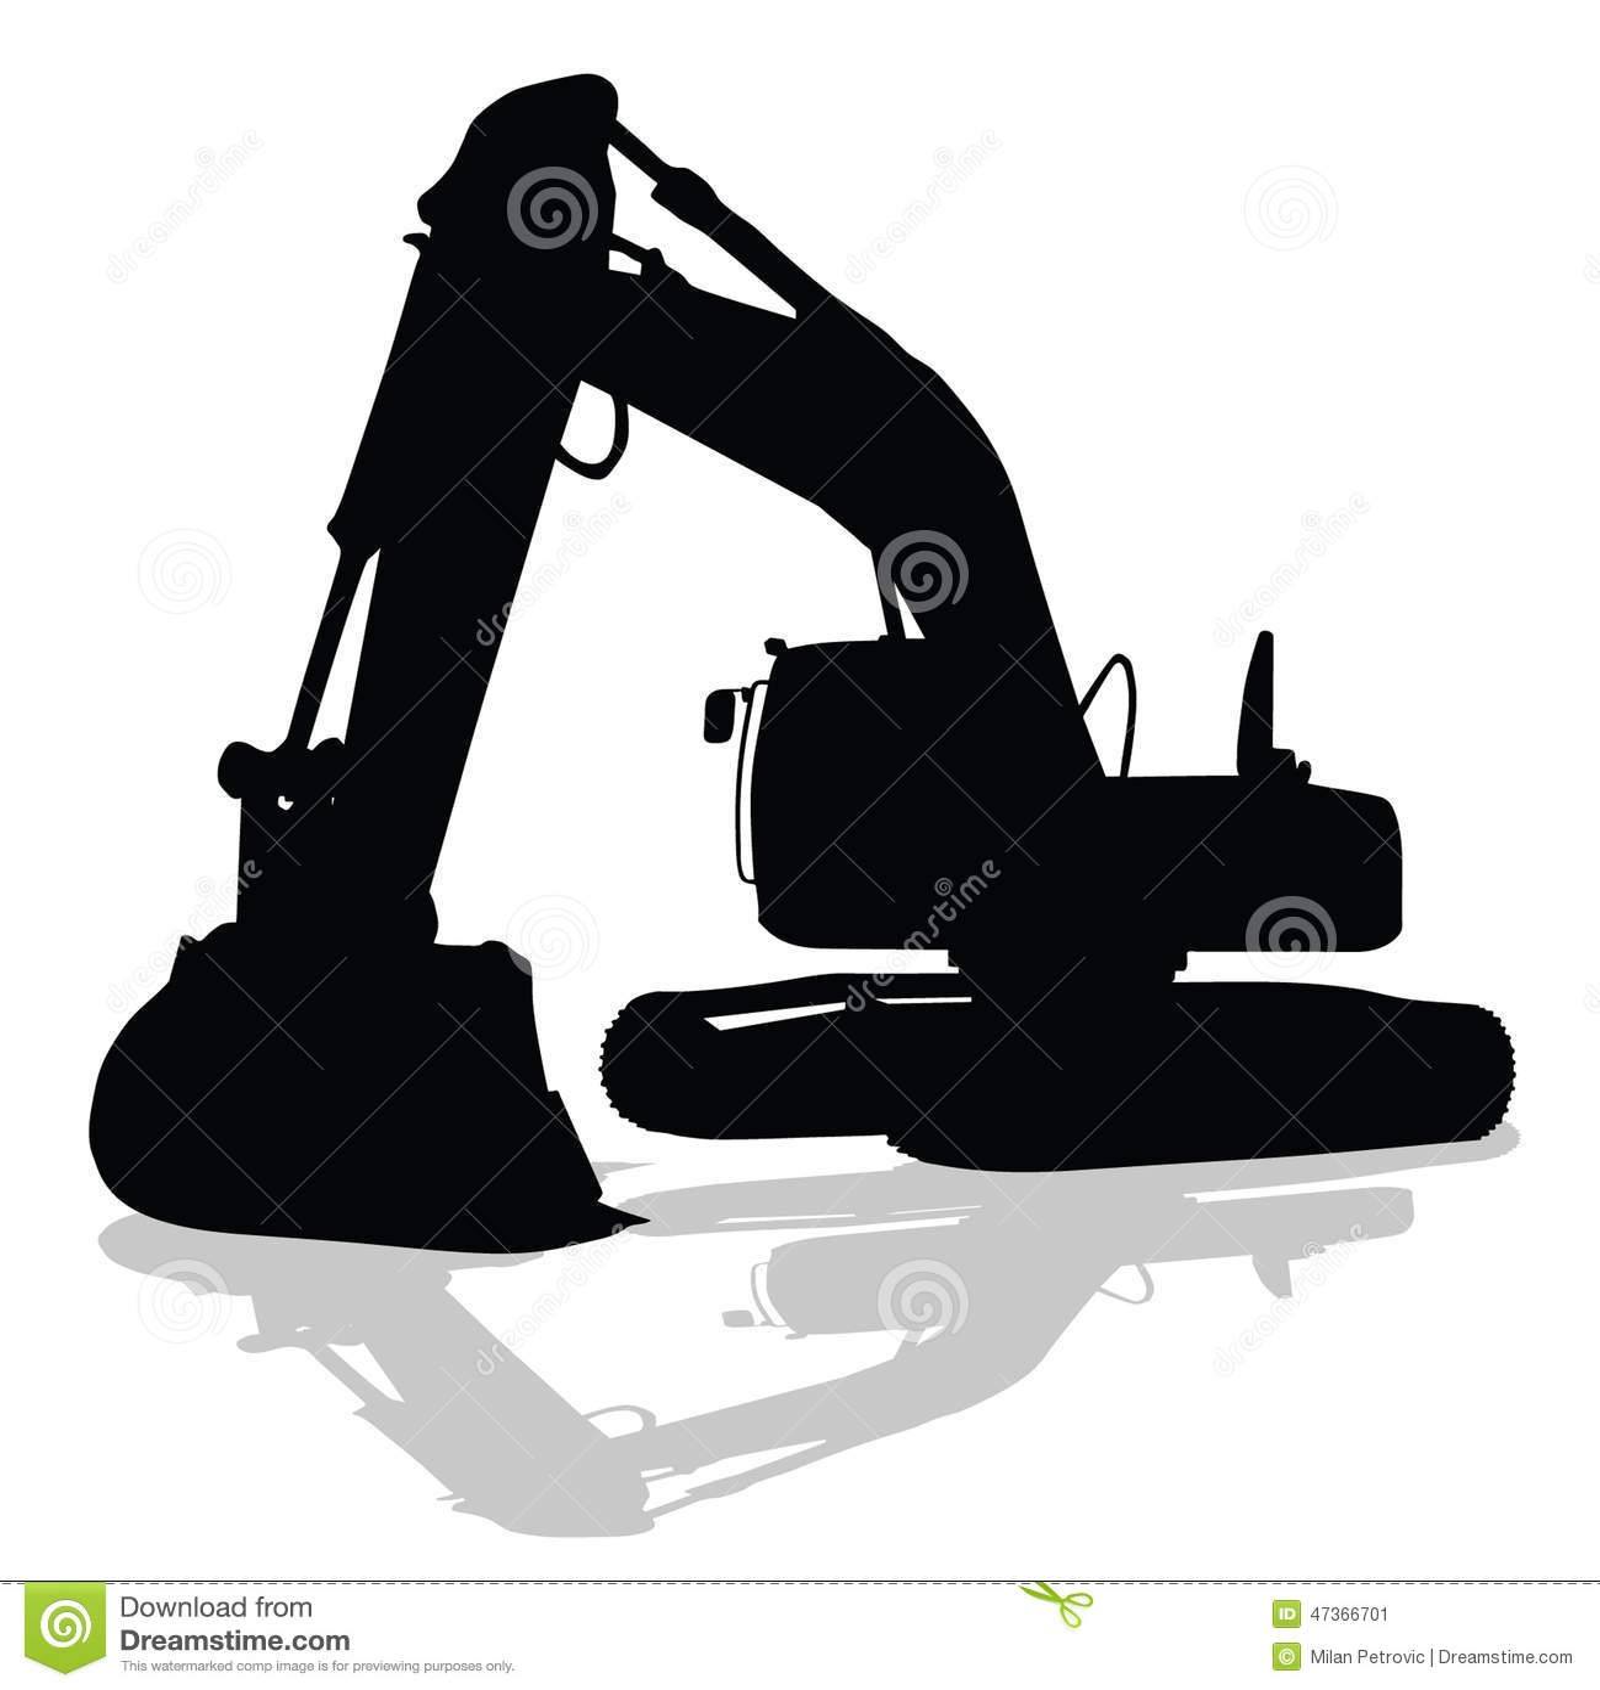 work machine